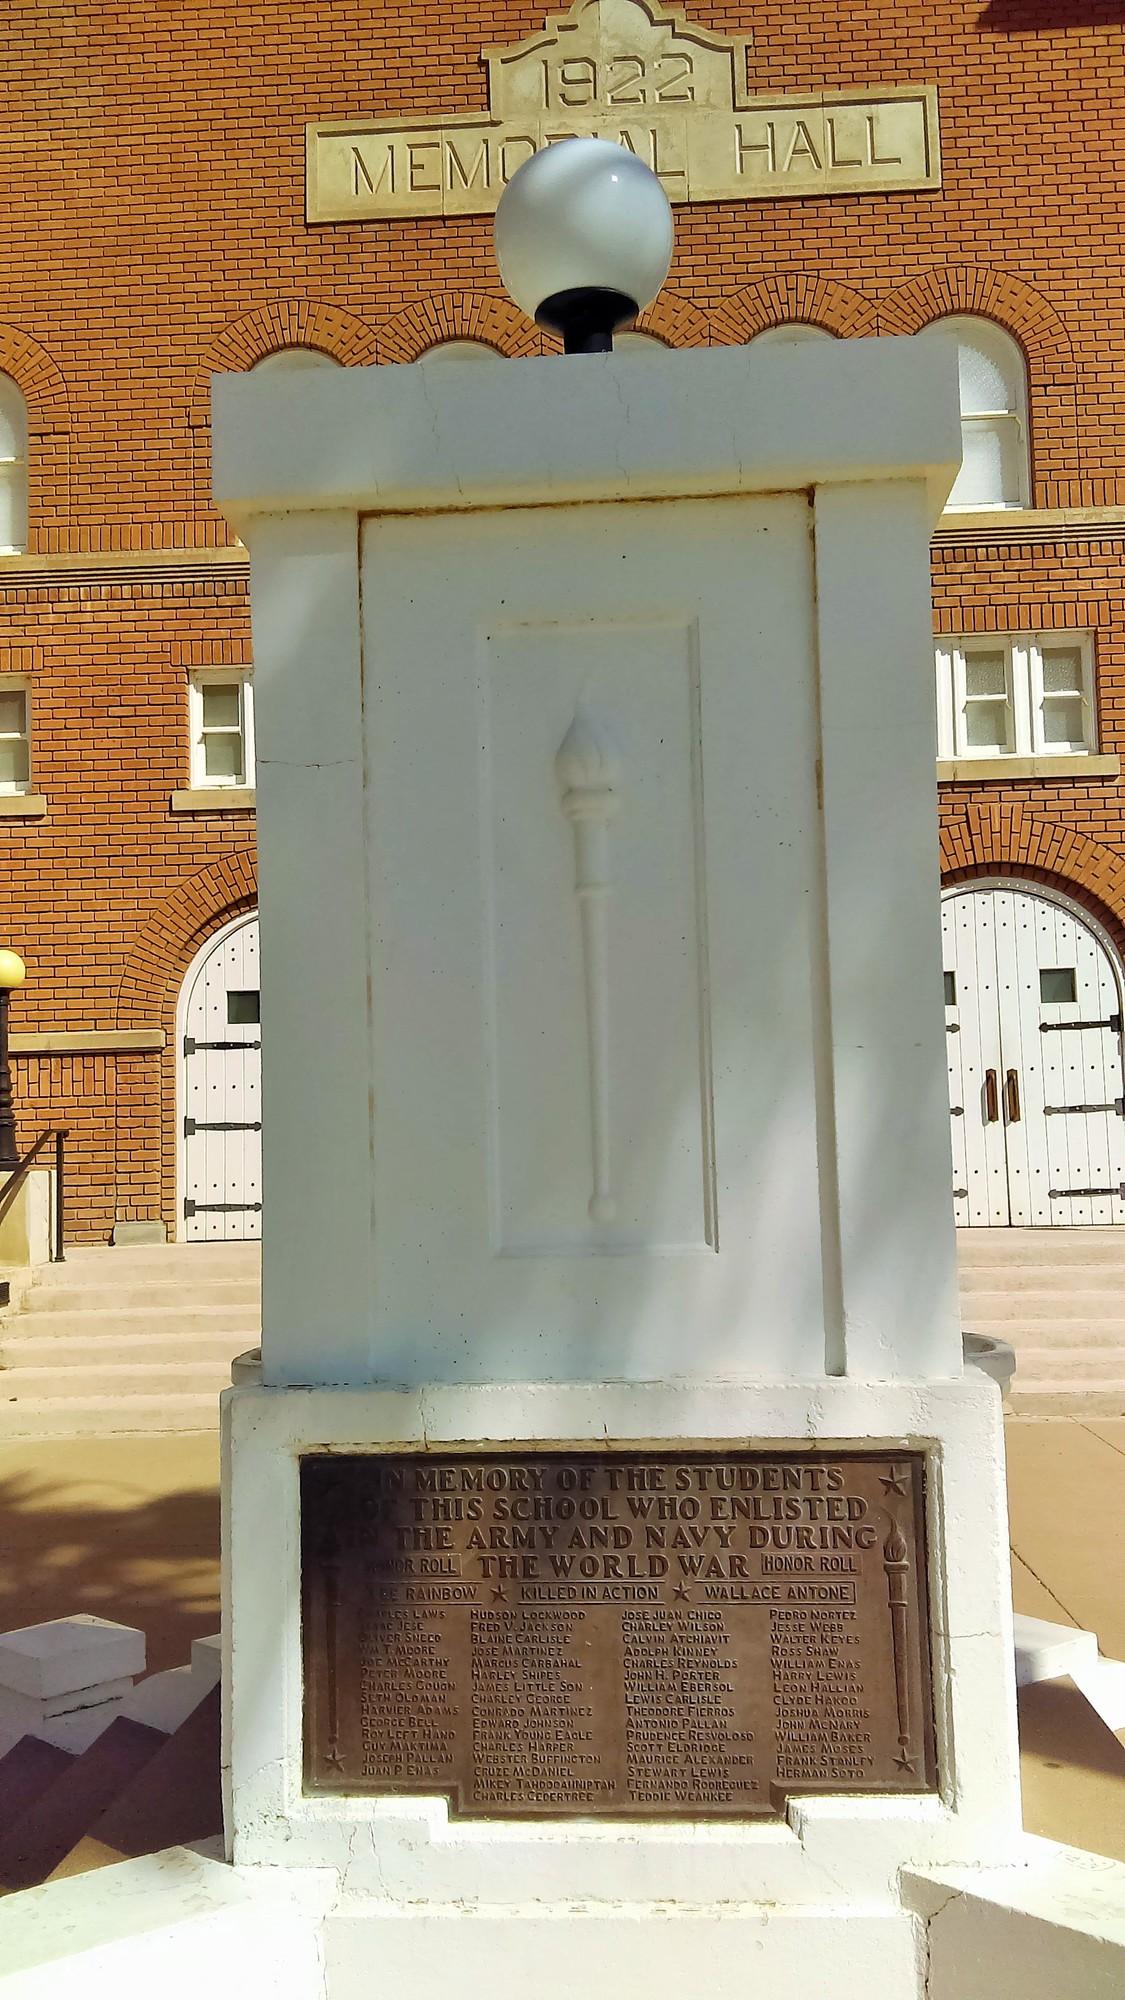 Steele Indian School Memorial Hall and World War I Memorial (AZ)